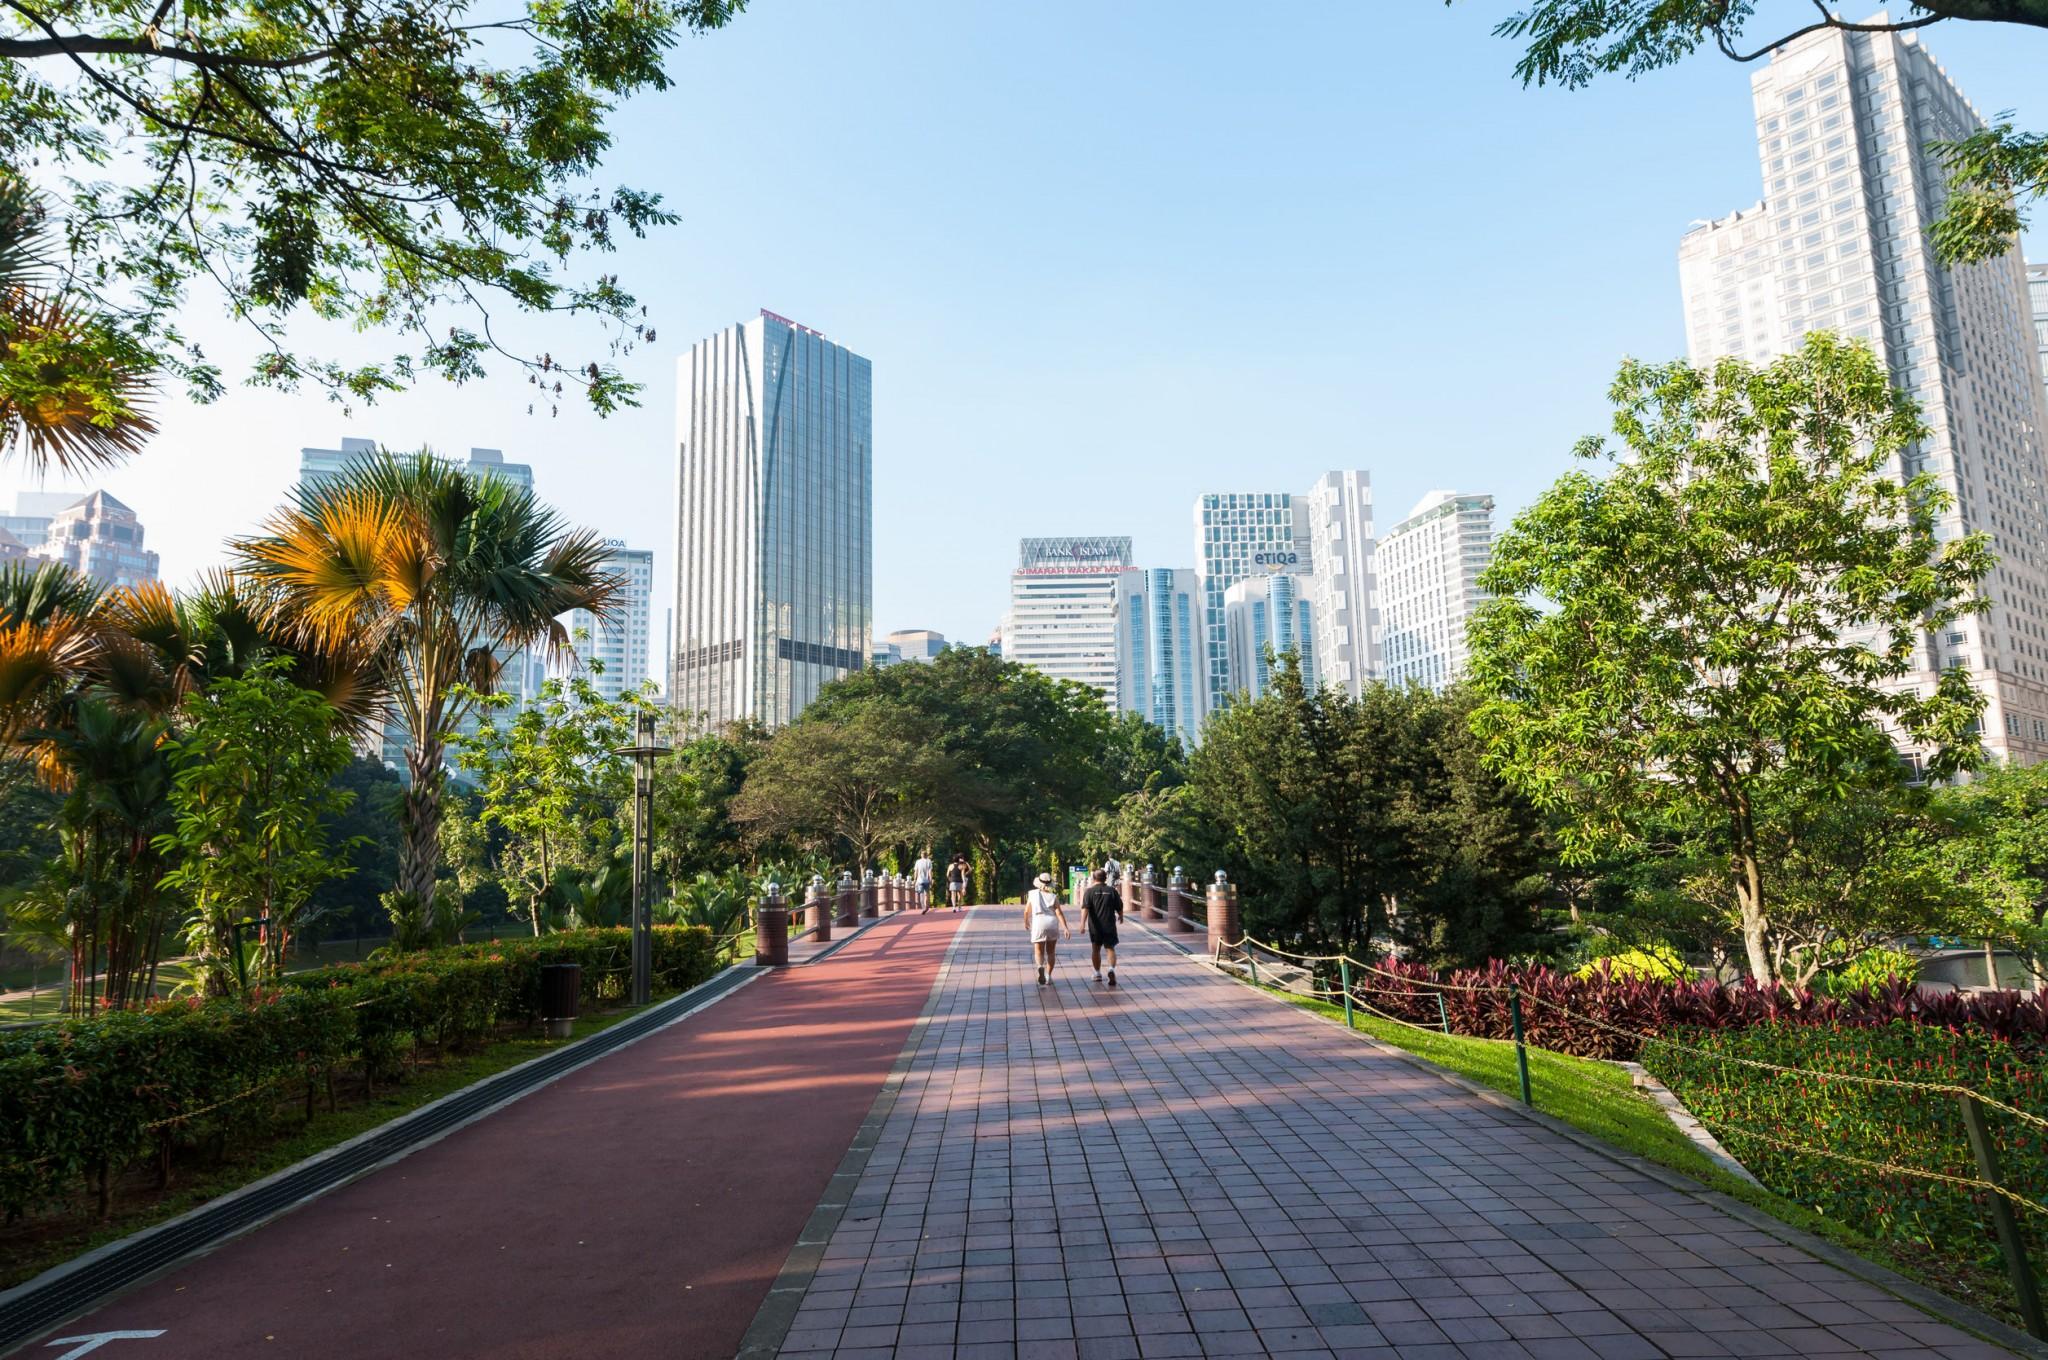 Kuala Lumpur City Centre Park Justrunlah